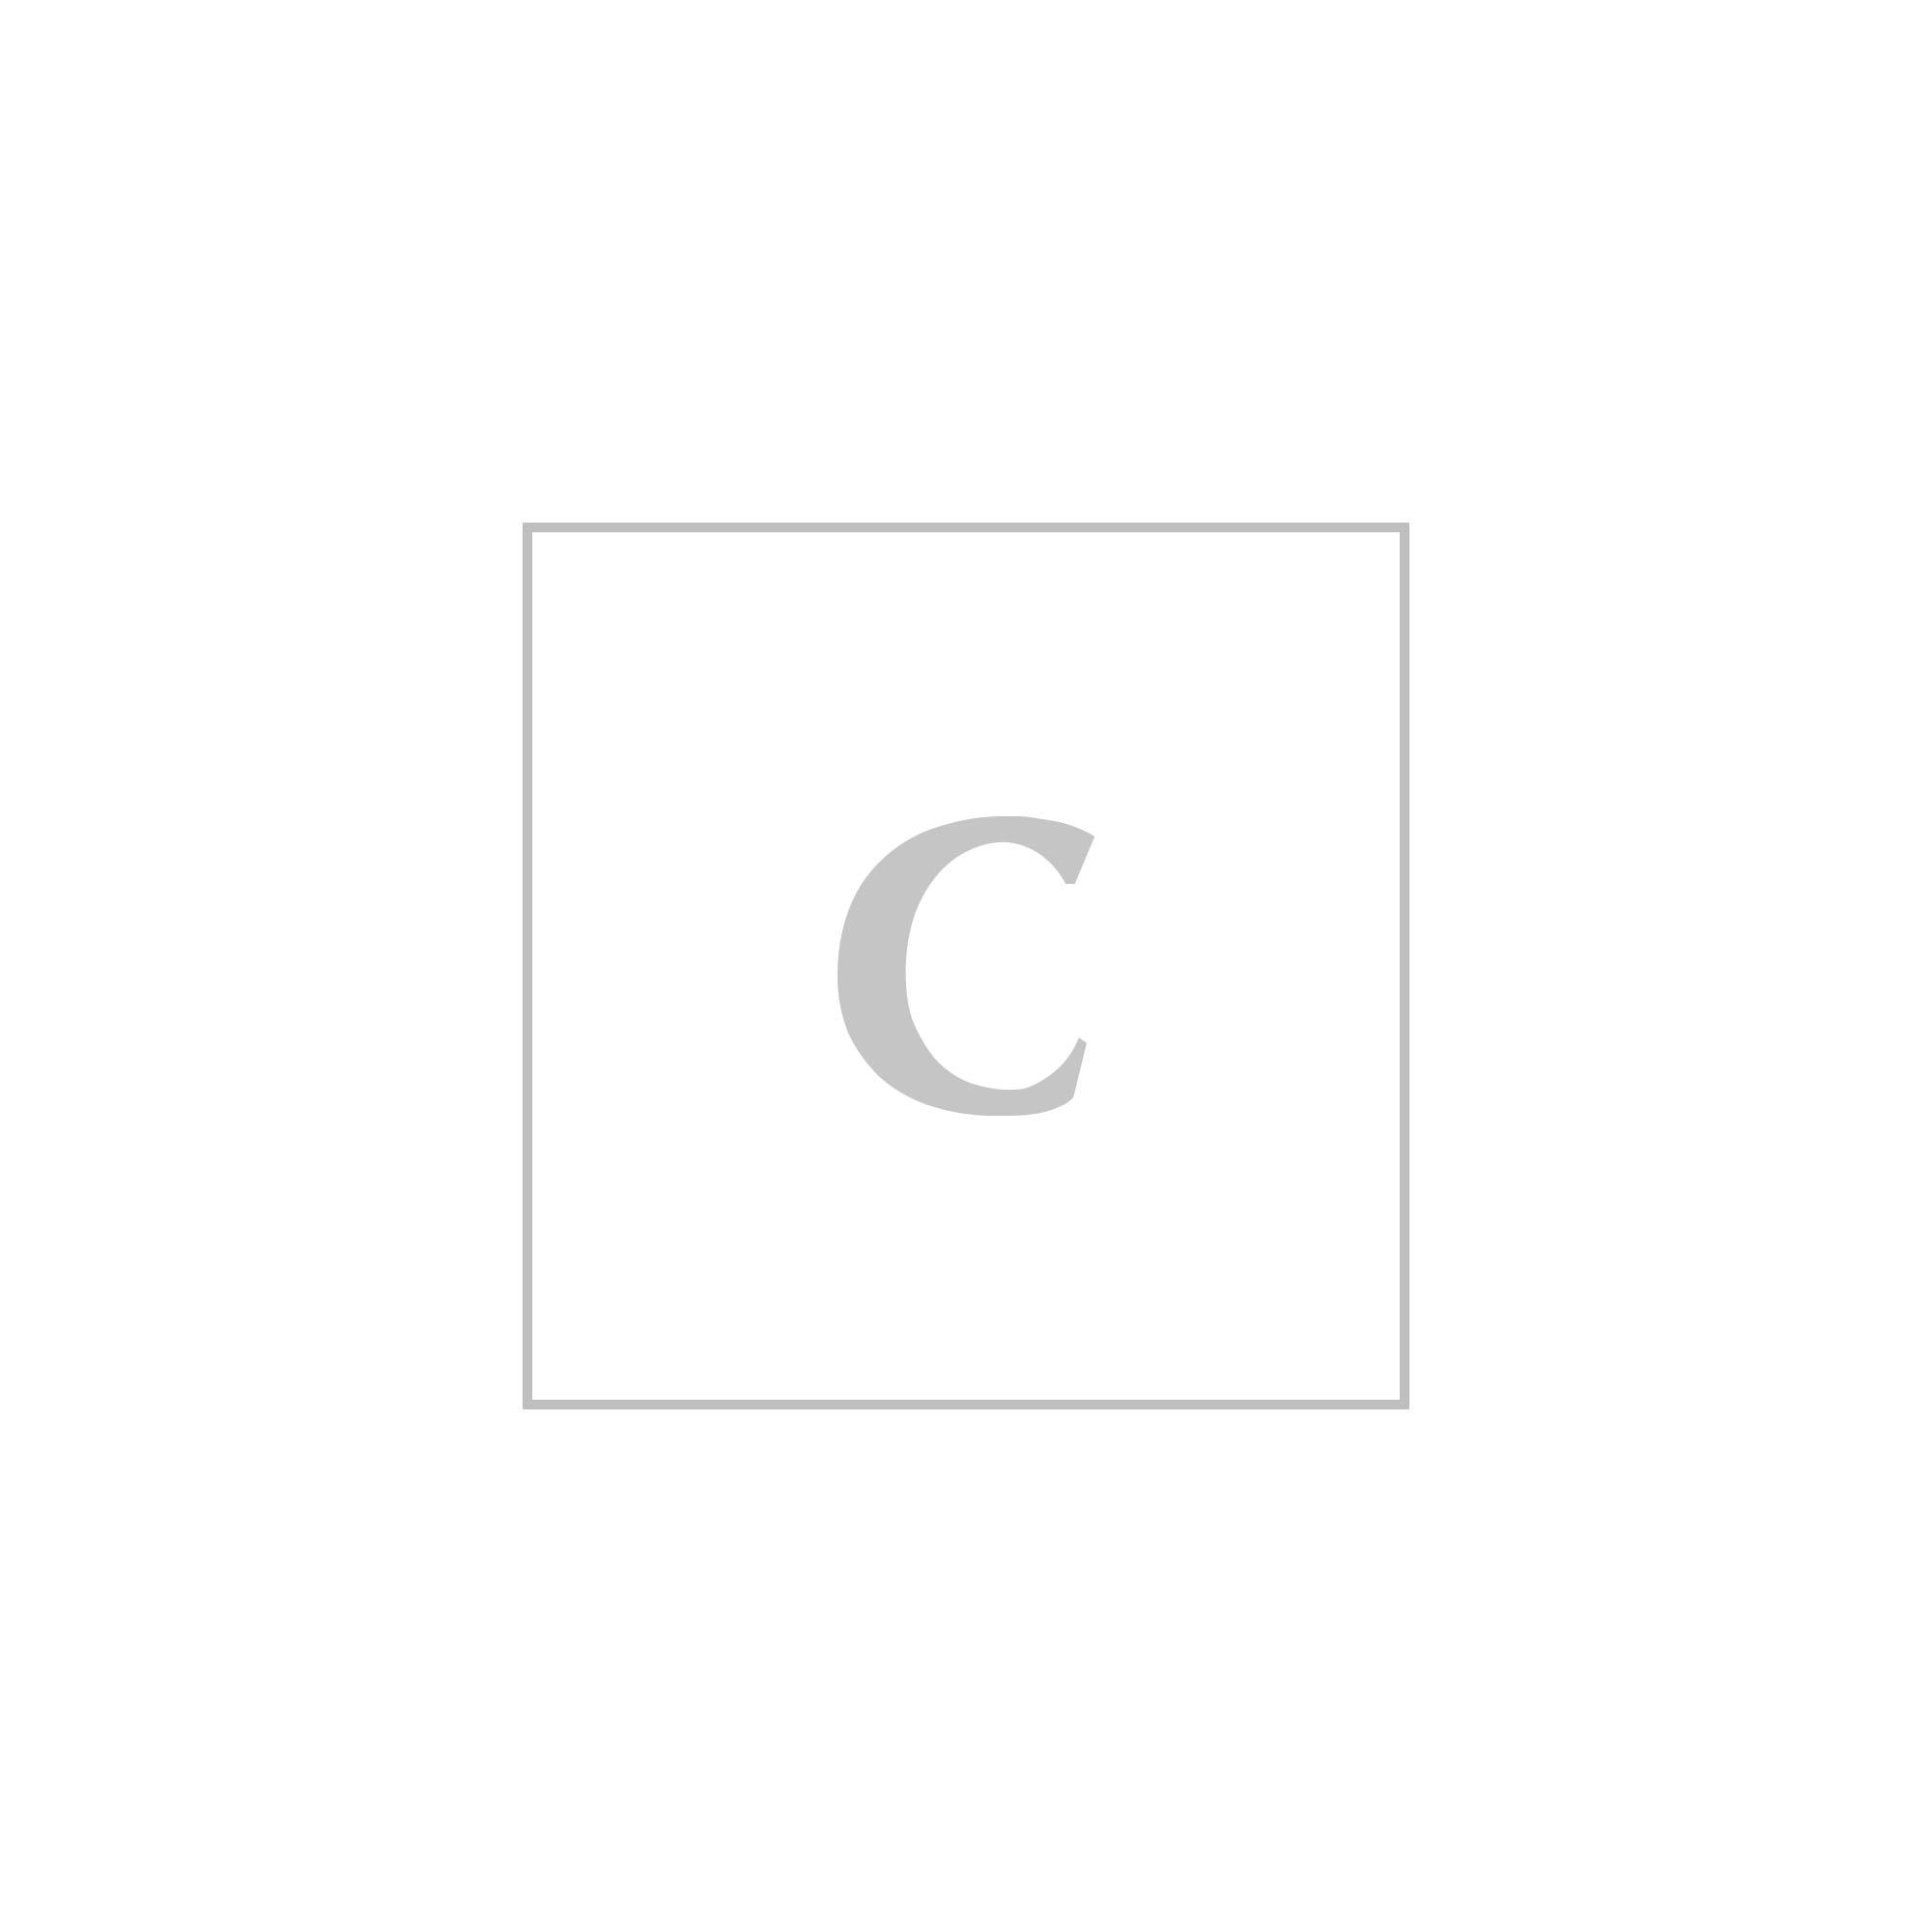 Christian Dior borsa lady dior cannege grained